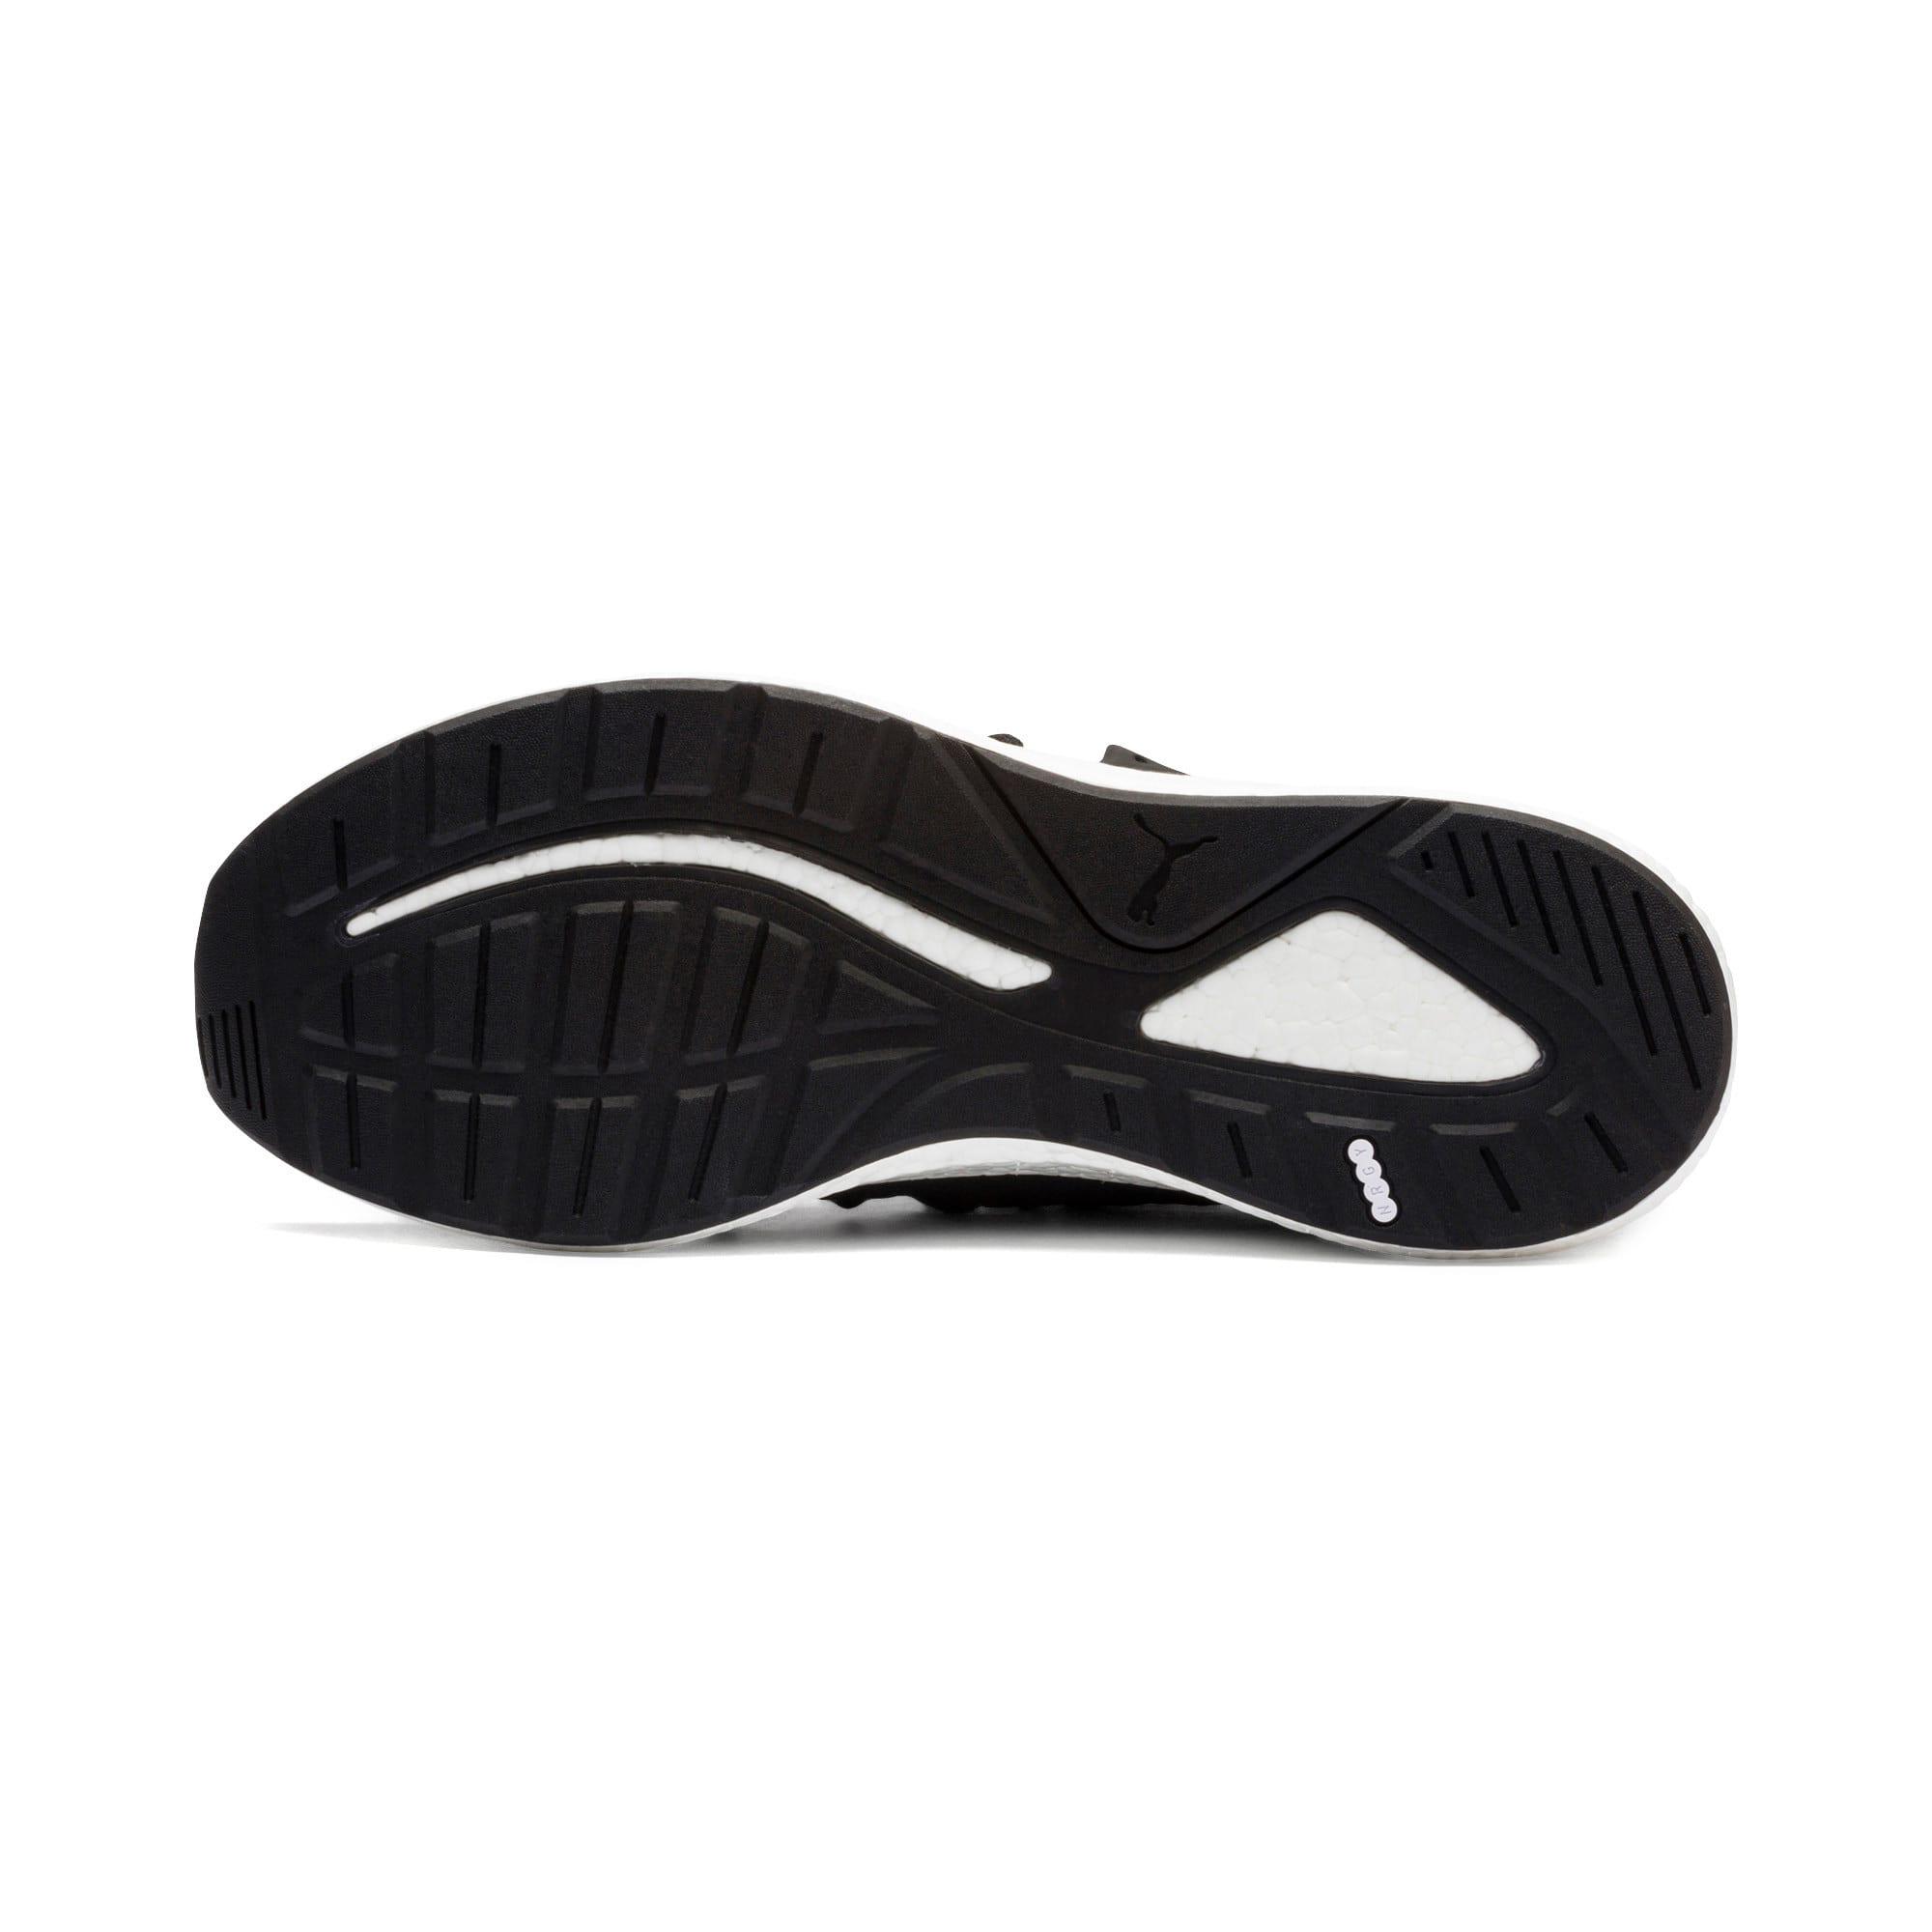 Thumbnail 3 of NRGY Neko Knit Men's Running Shoes, Puma Black-High Risk Red, medium